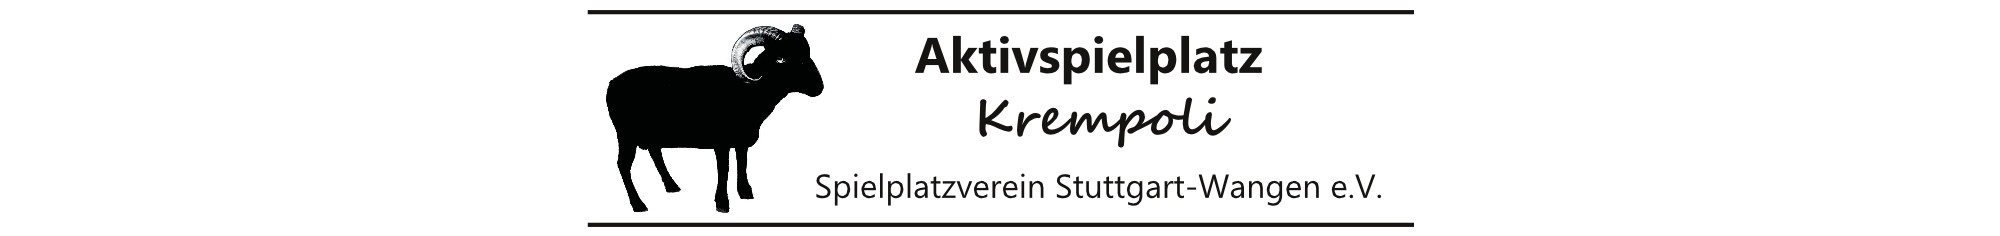 Aktivspielplatz Krempoli